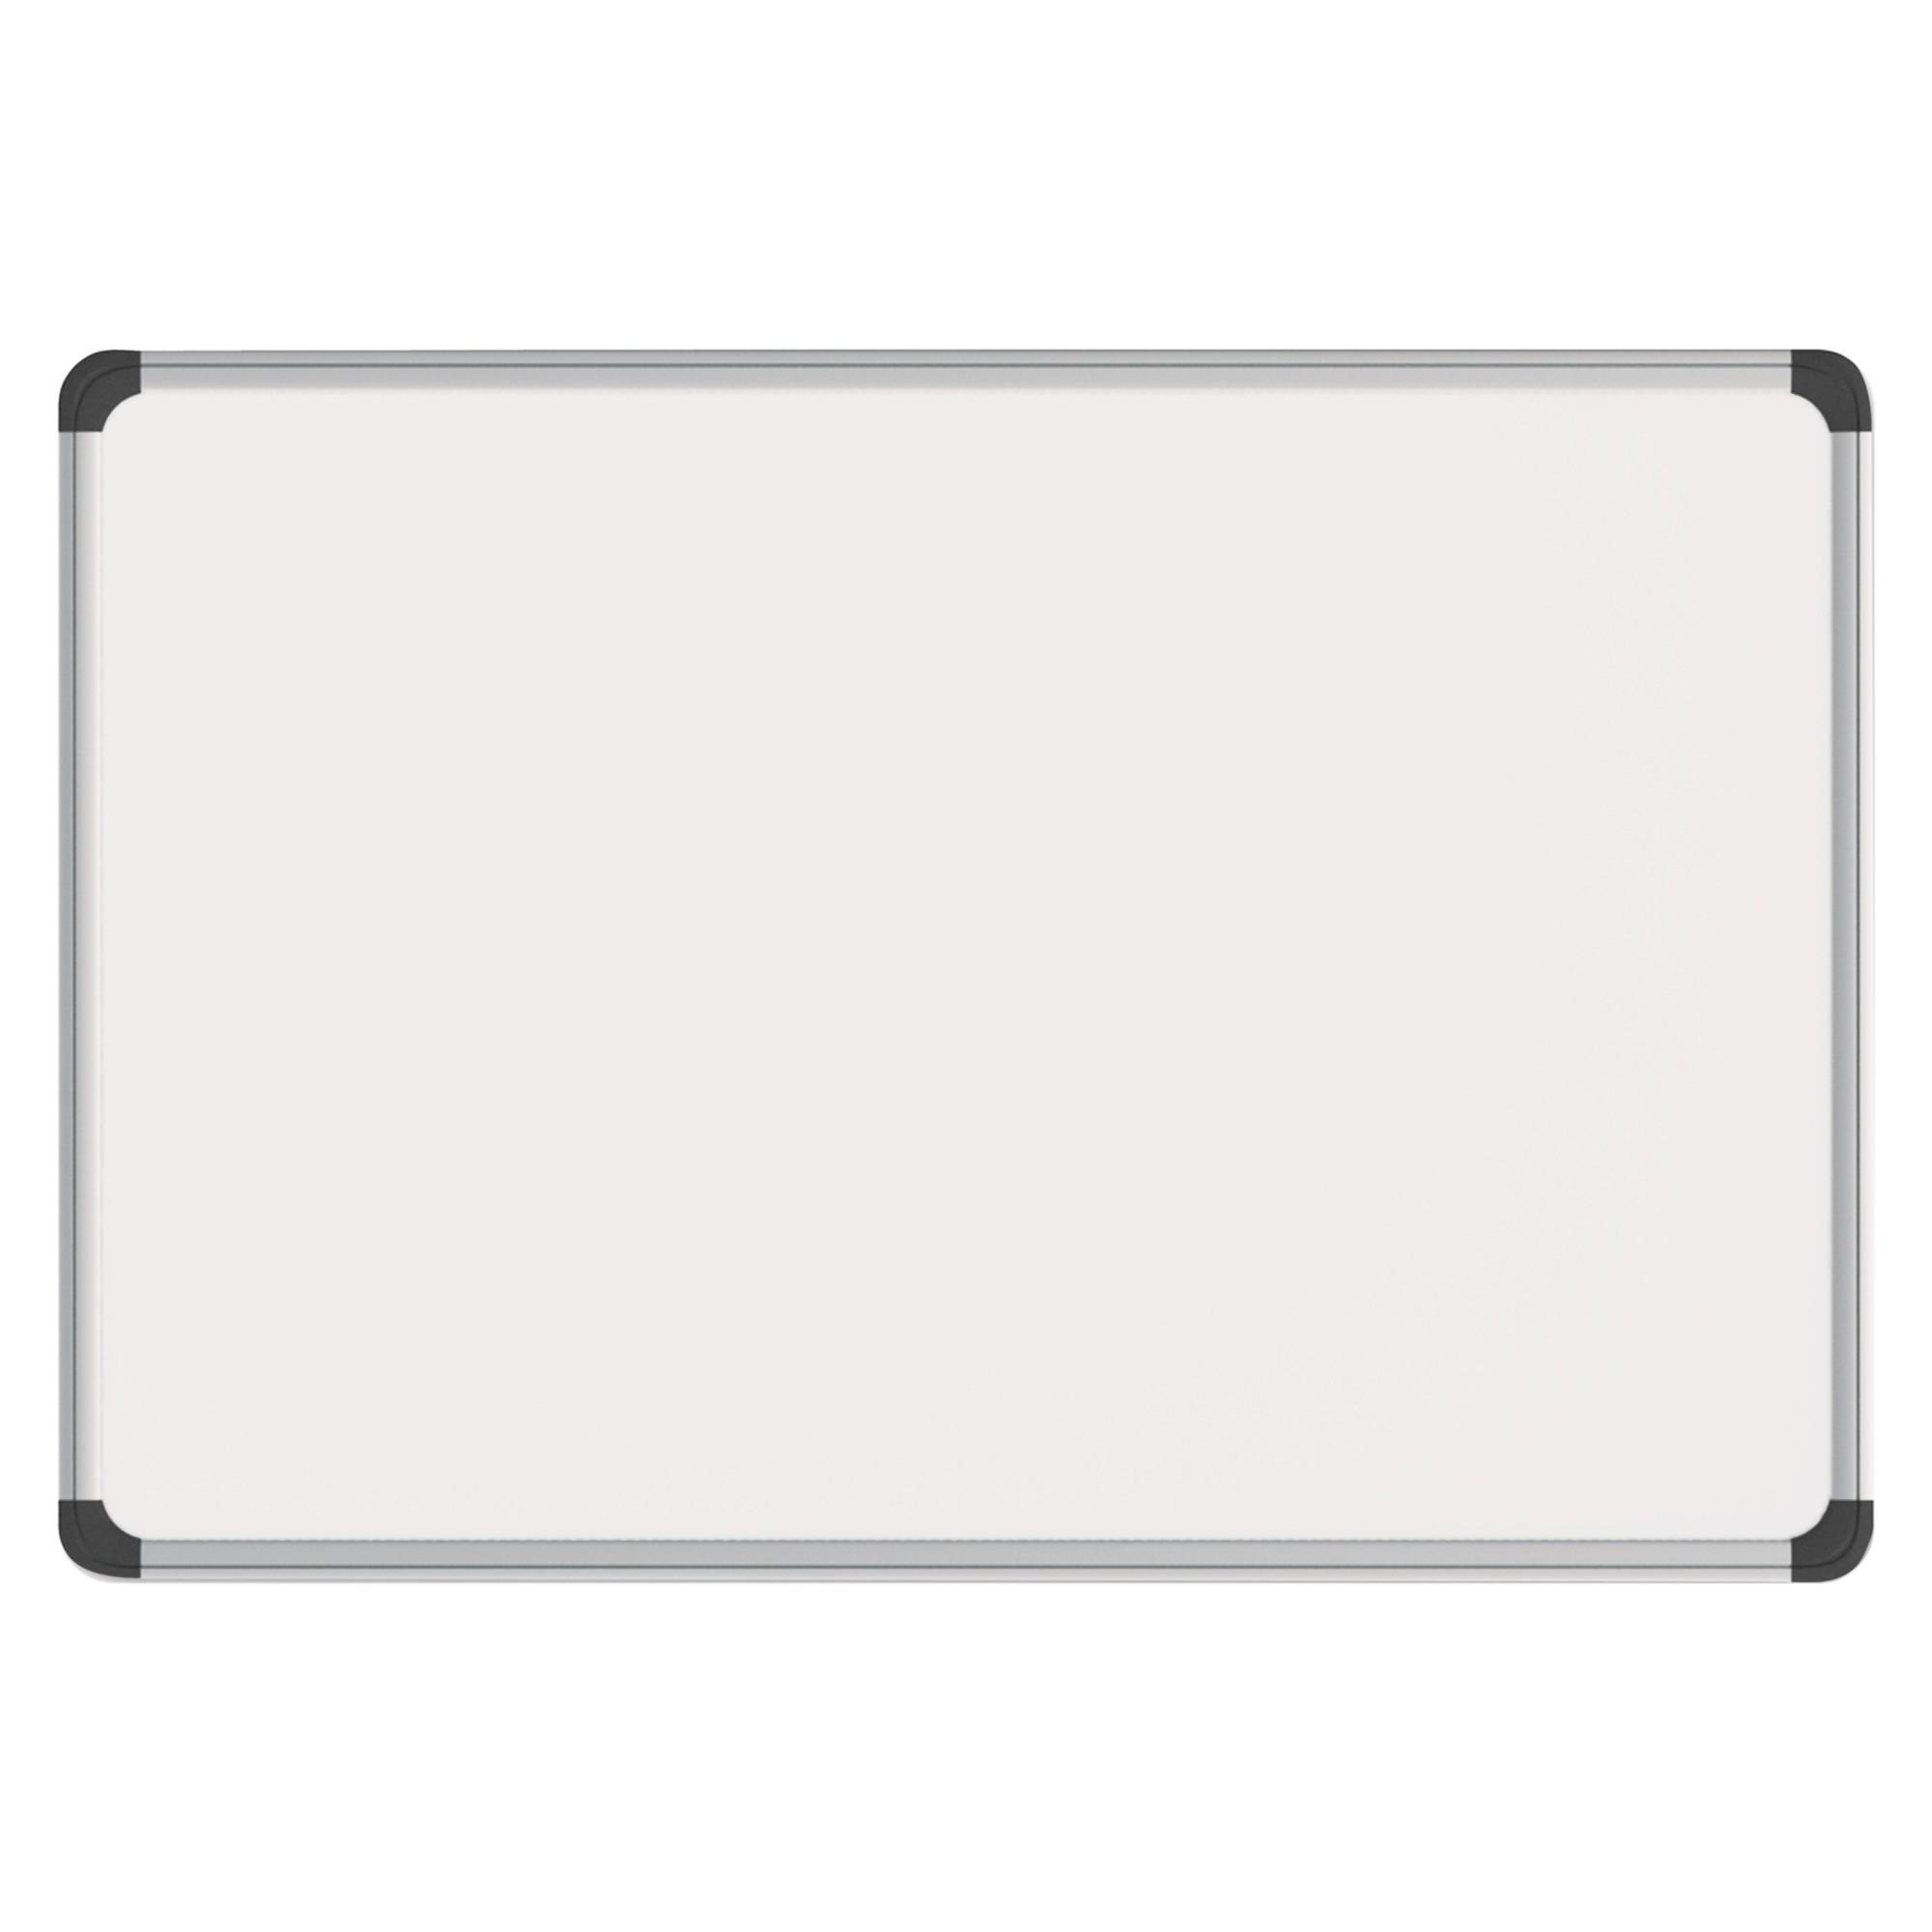 Magnetic Steel Dry Erase Board, 24 x 18, White, Aluminum Frame